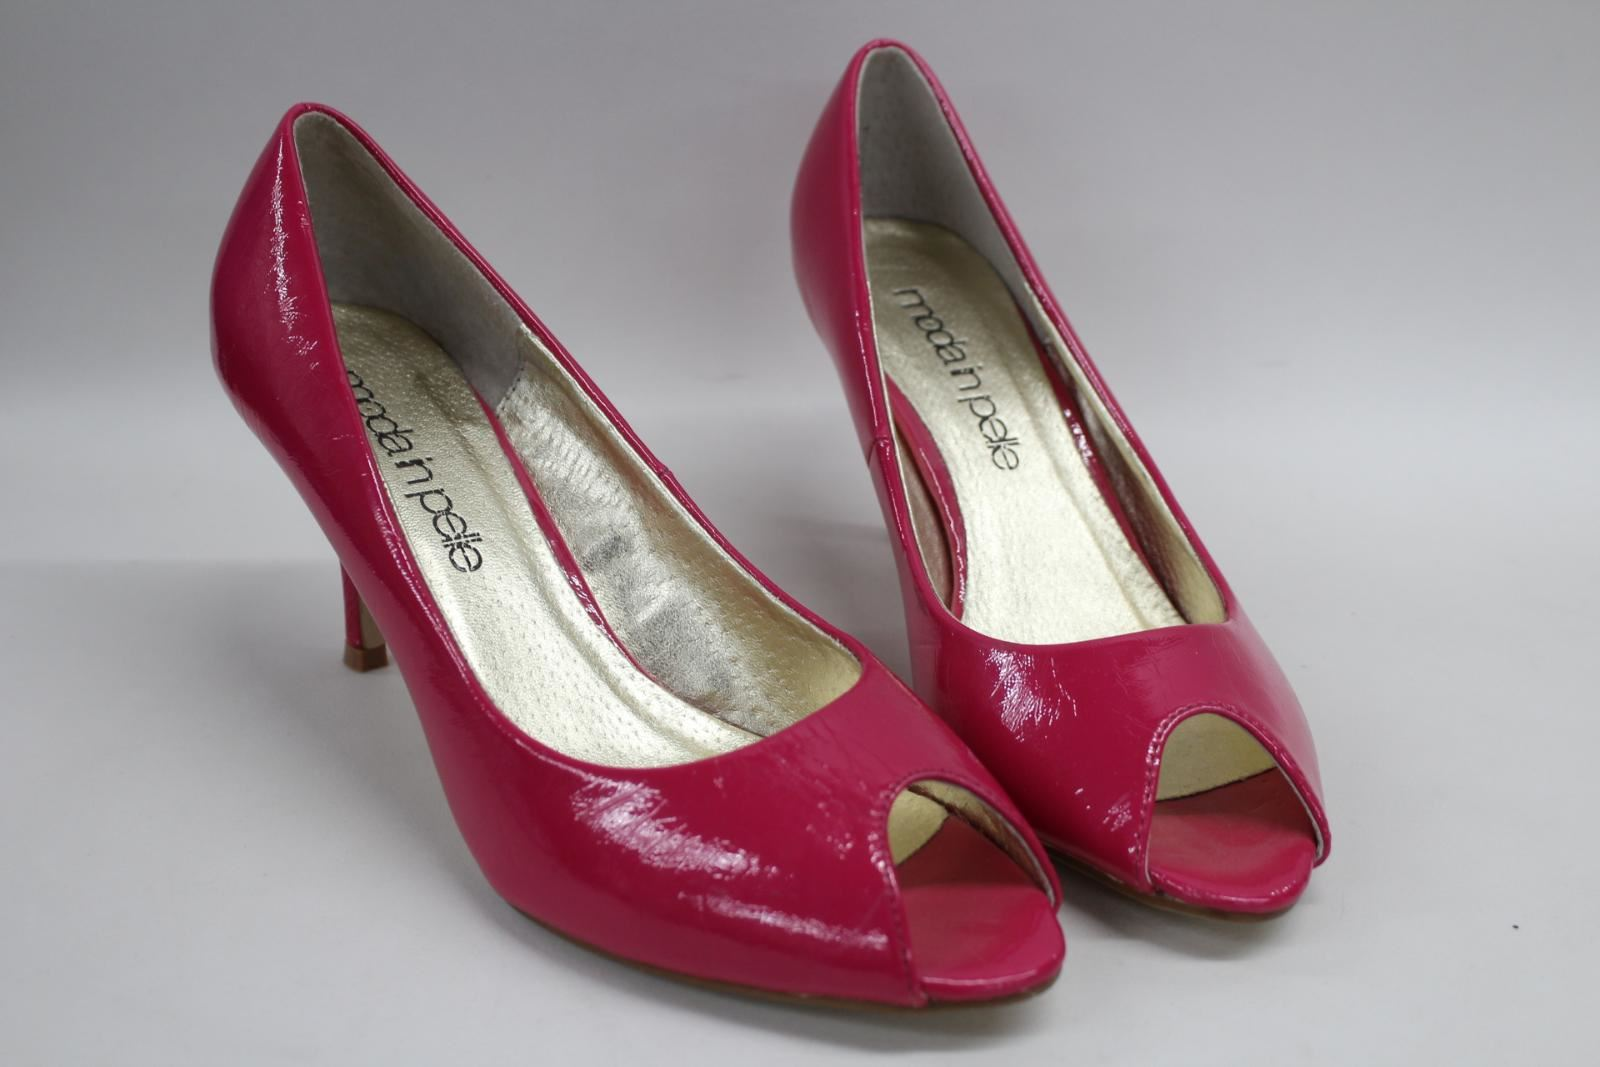 MODA-IN-PELLE-Ladies-Patent-Peep-Toe-Pink-3-034-Slim-Heel-Court-Shoes-EU39-UK6